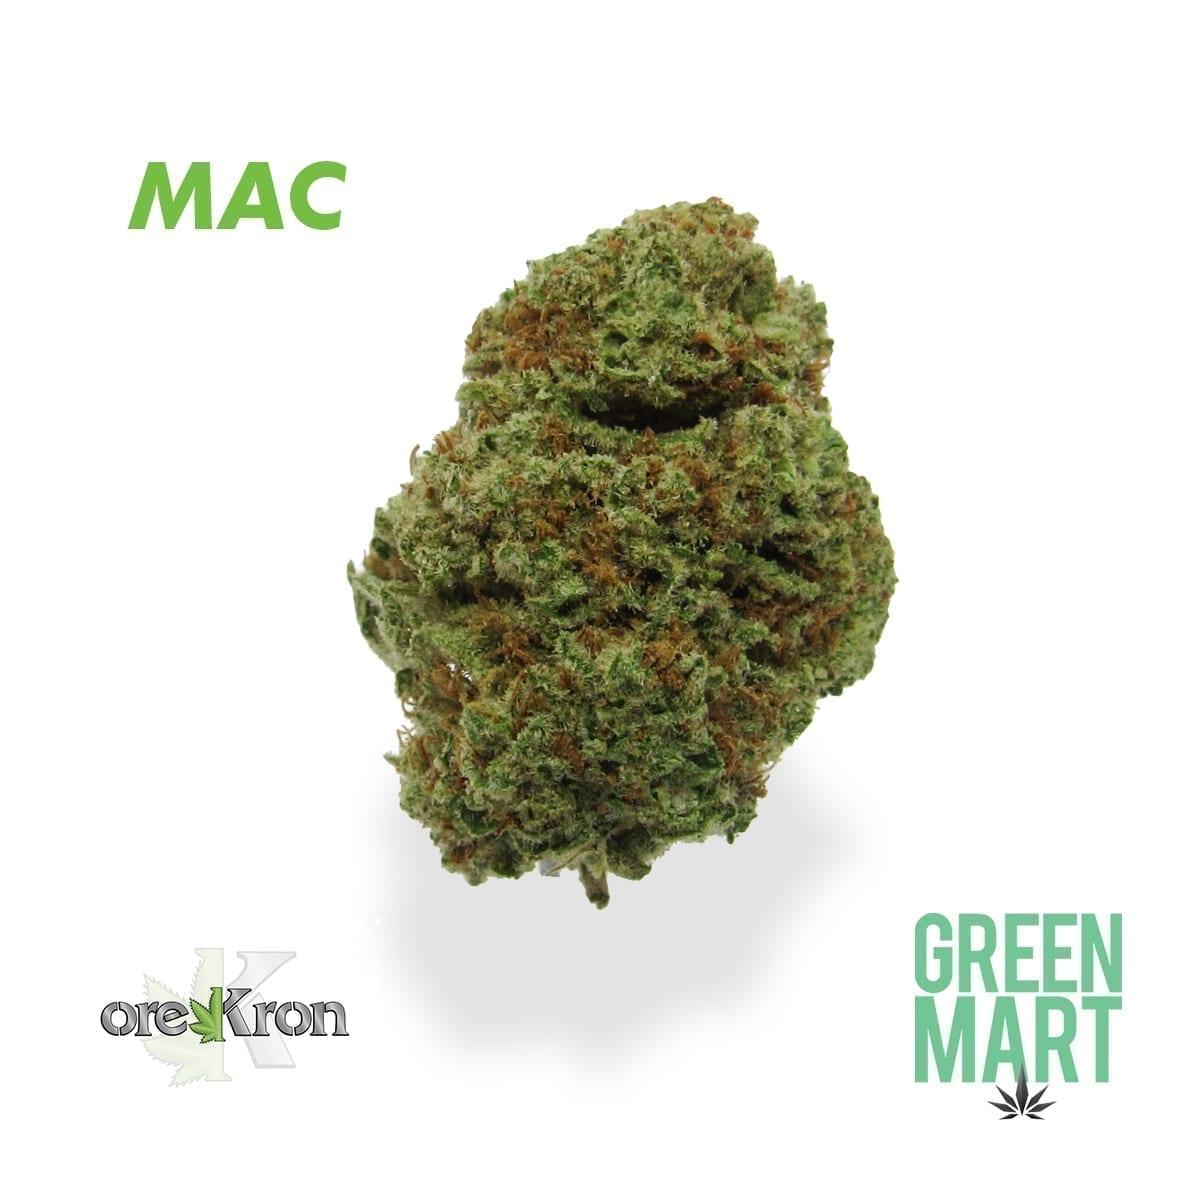 MacOrekron